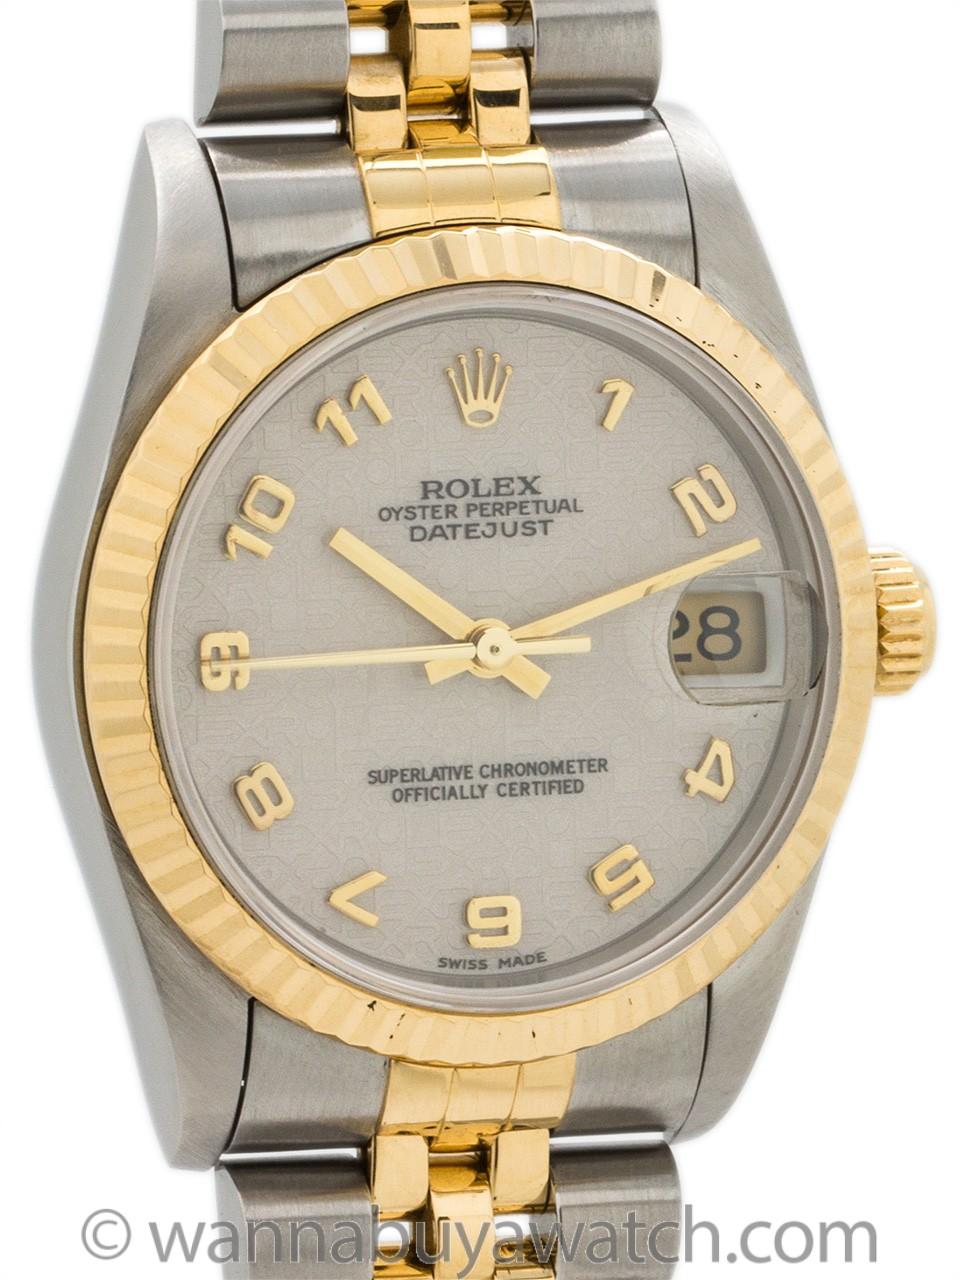 Rolex Datejust SS/18K Gold ref 68273 circa 1996